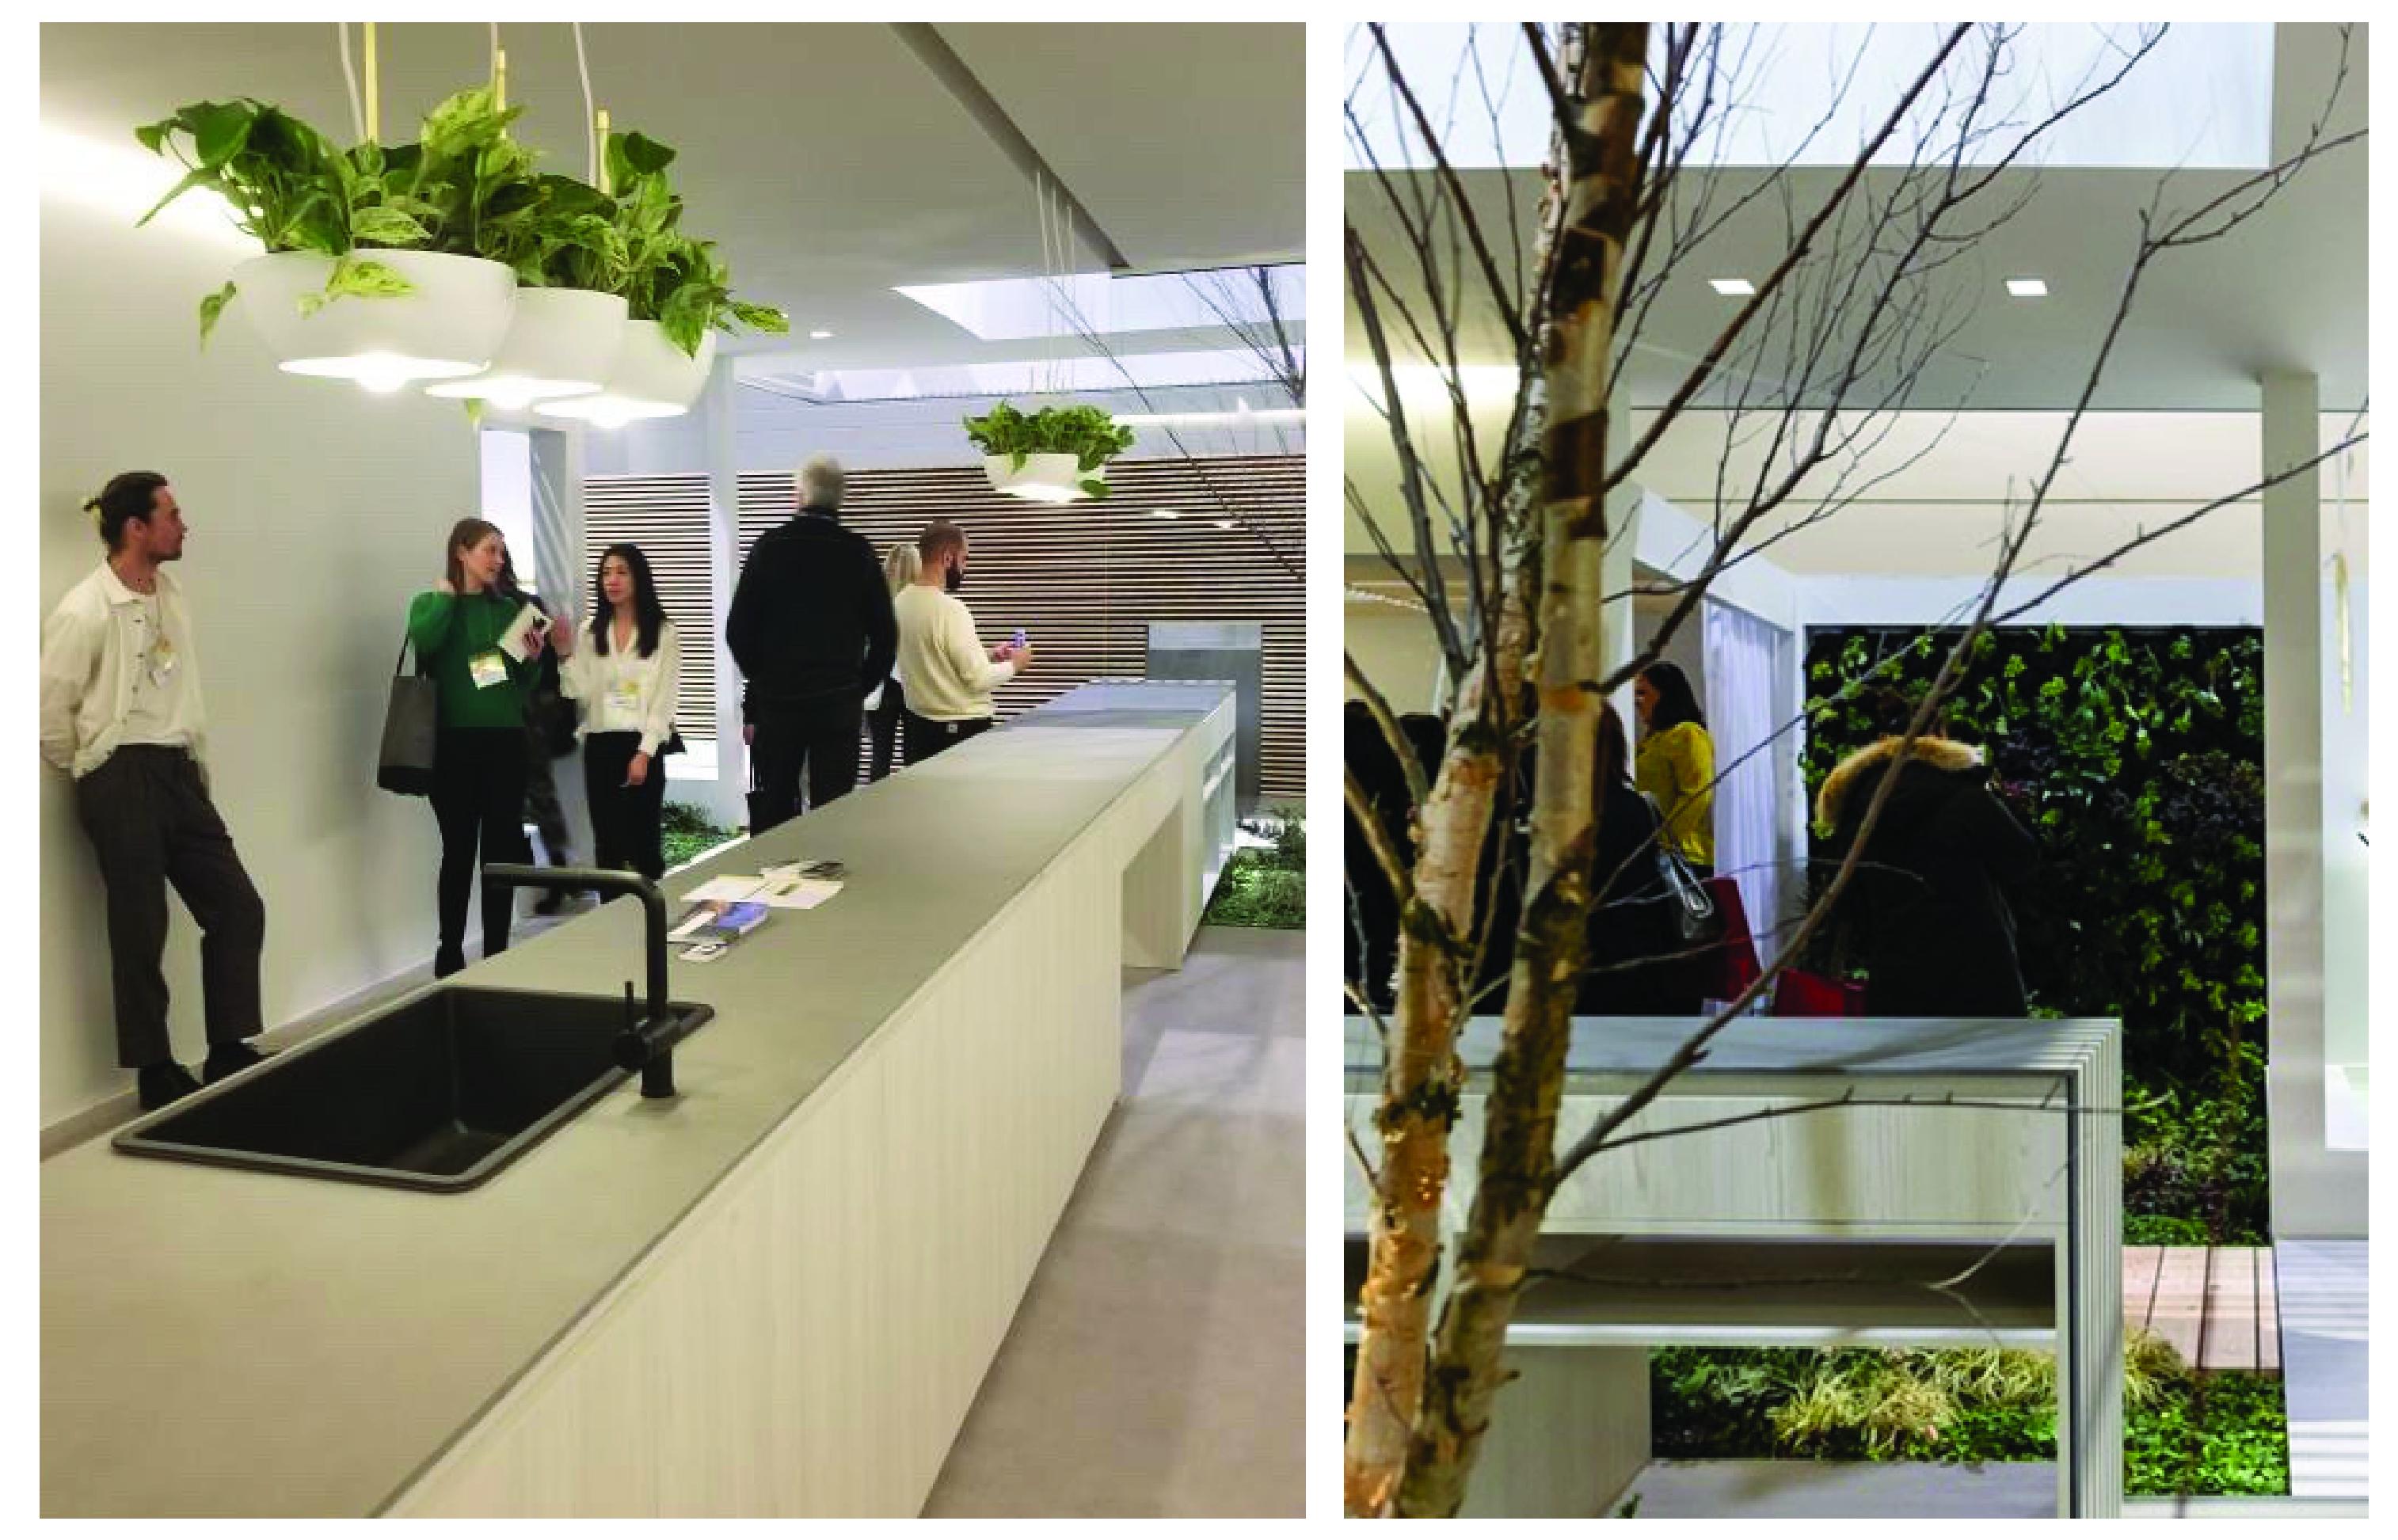 interior-design-show-ids-toronto-reset-home-euro-tile-stone-vfa-hummingbird-vtla-01